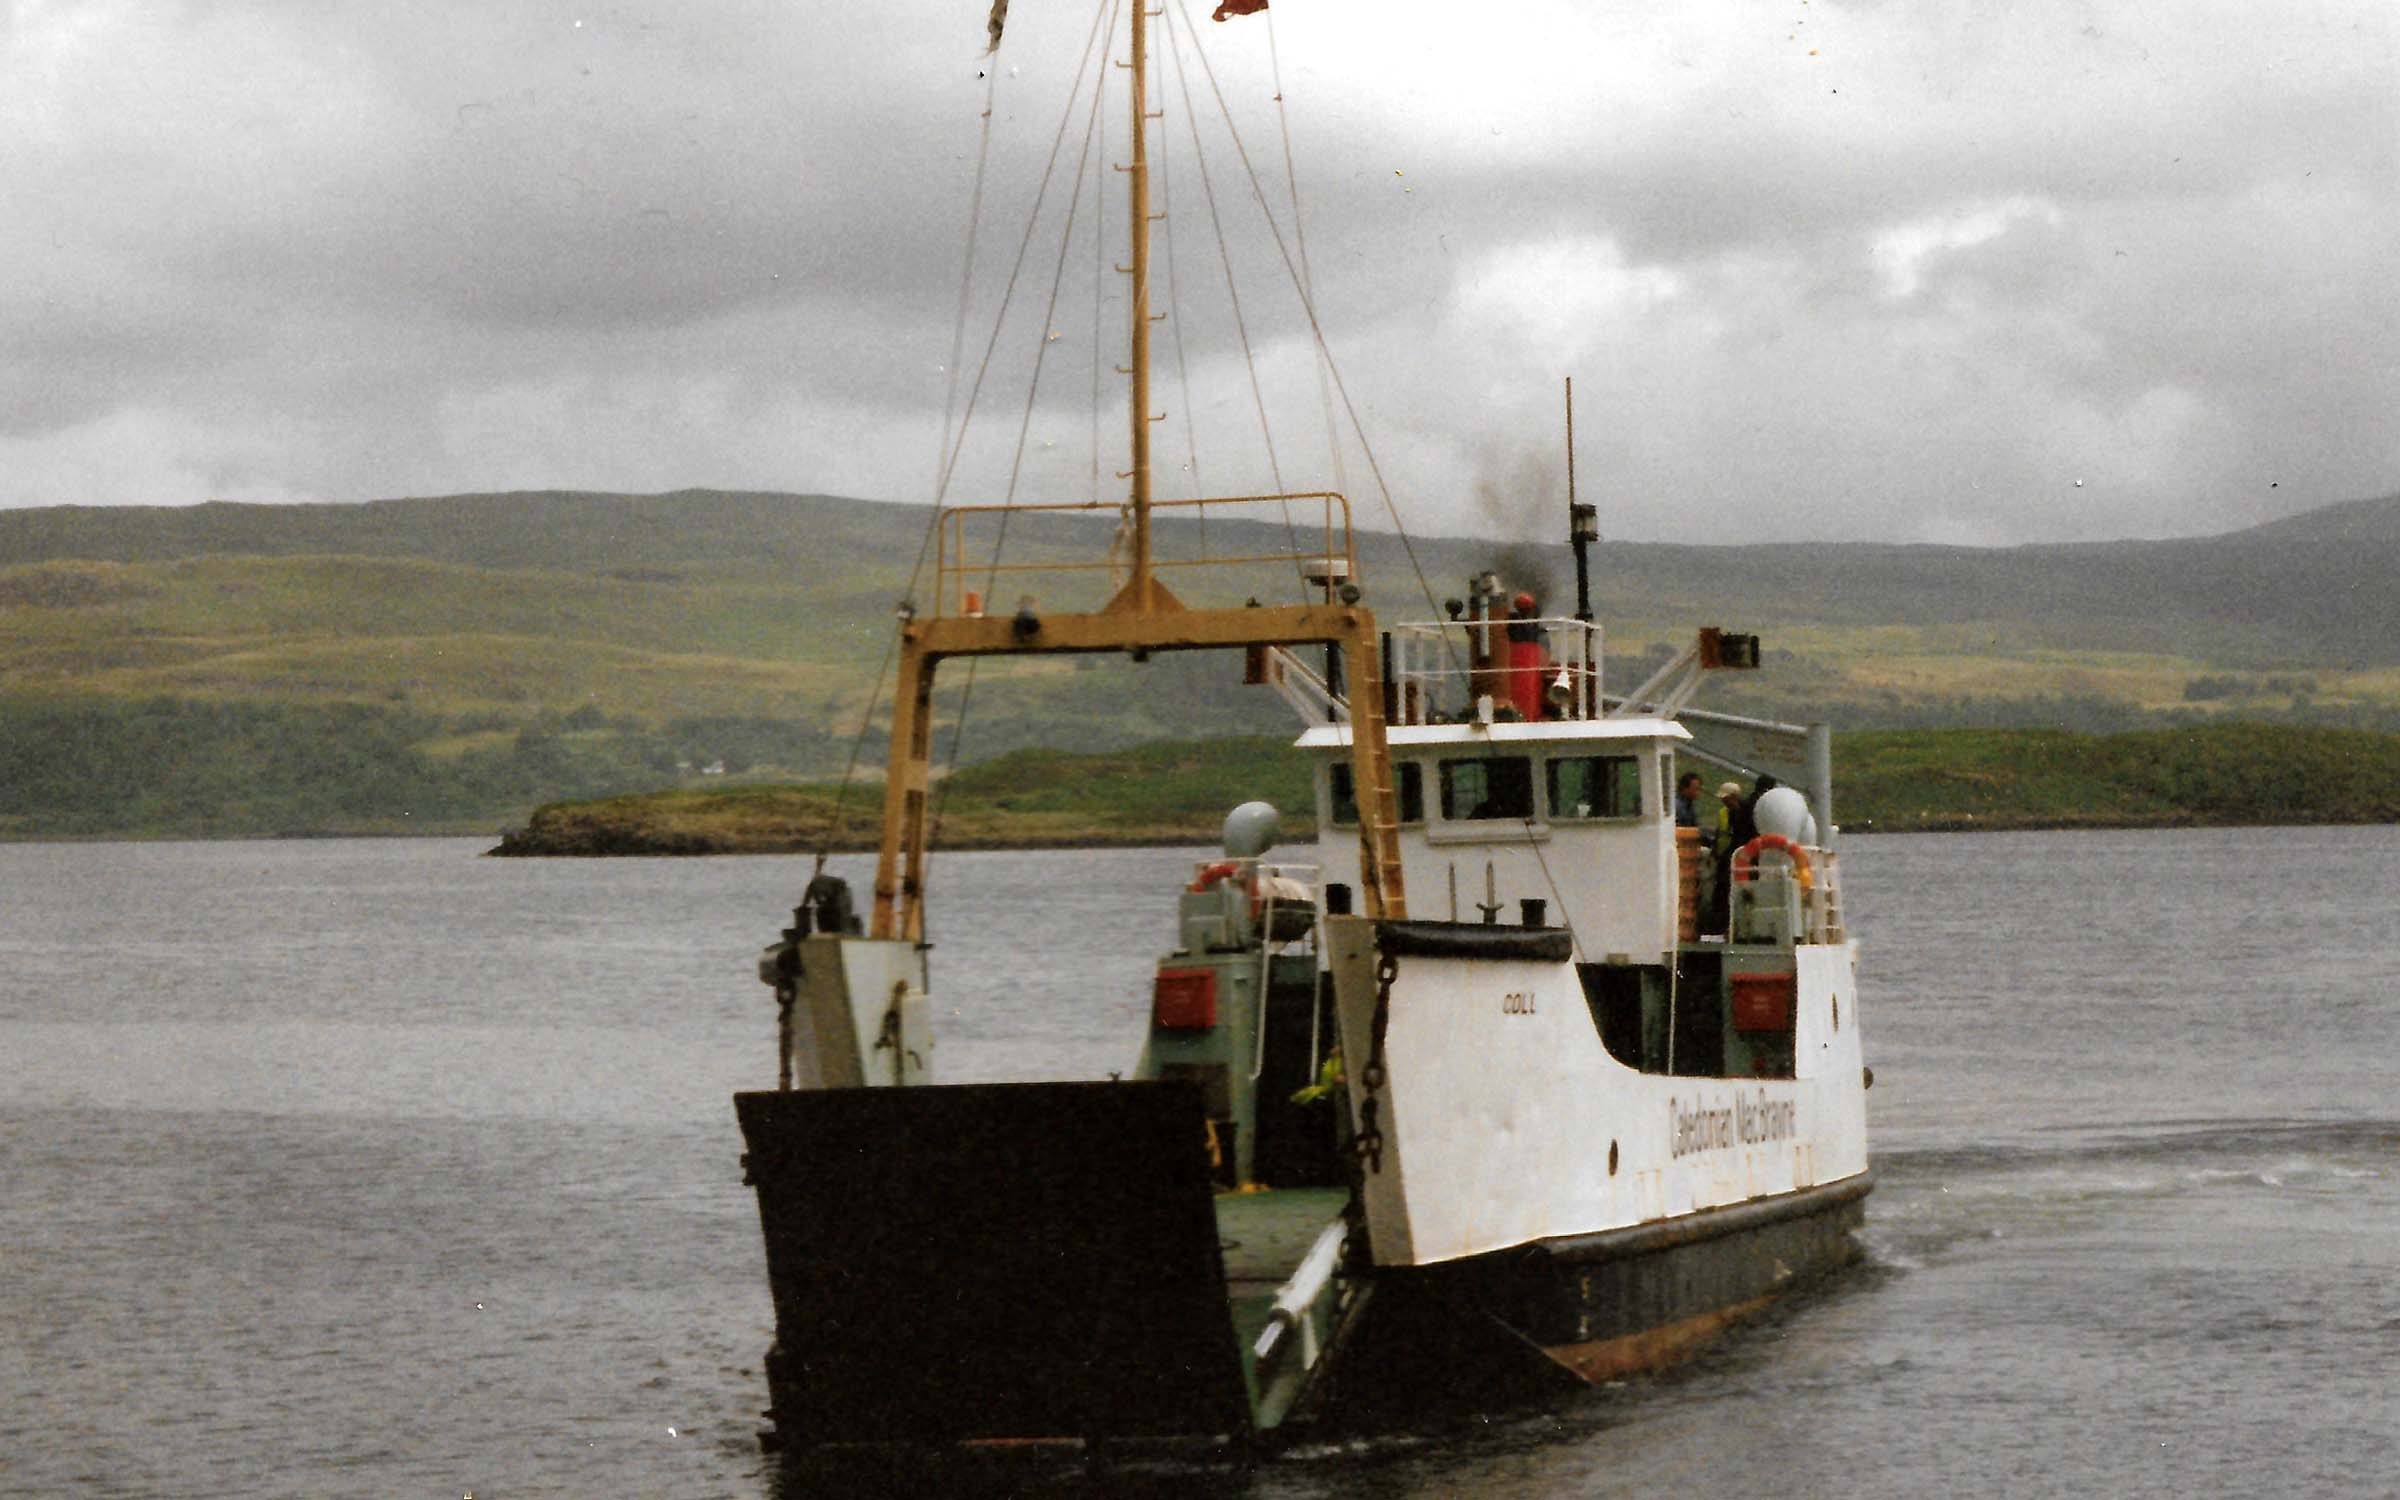 Coll coming onto Tobermory slipway (Ships of CalMac)